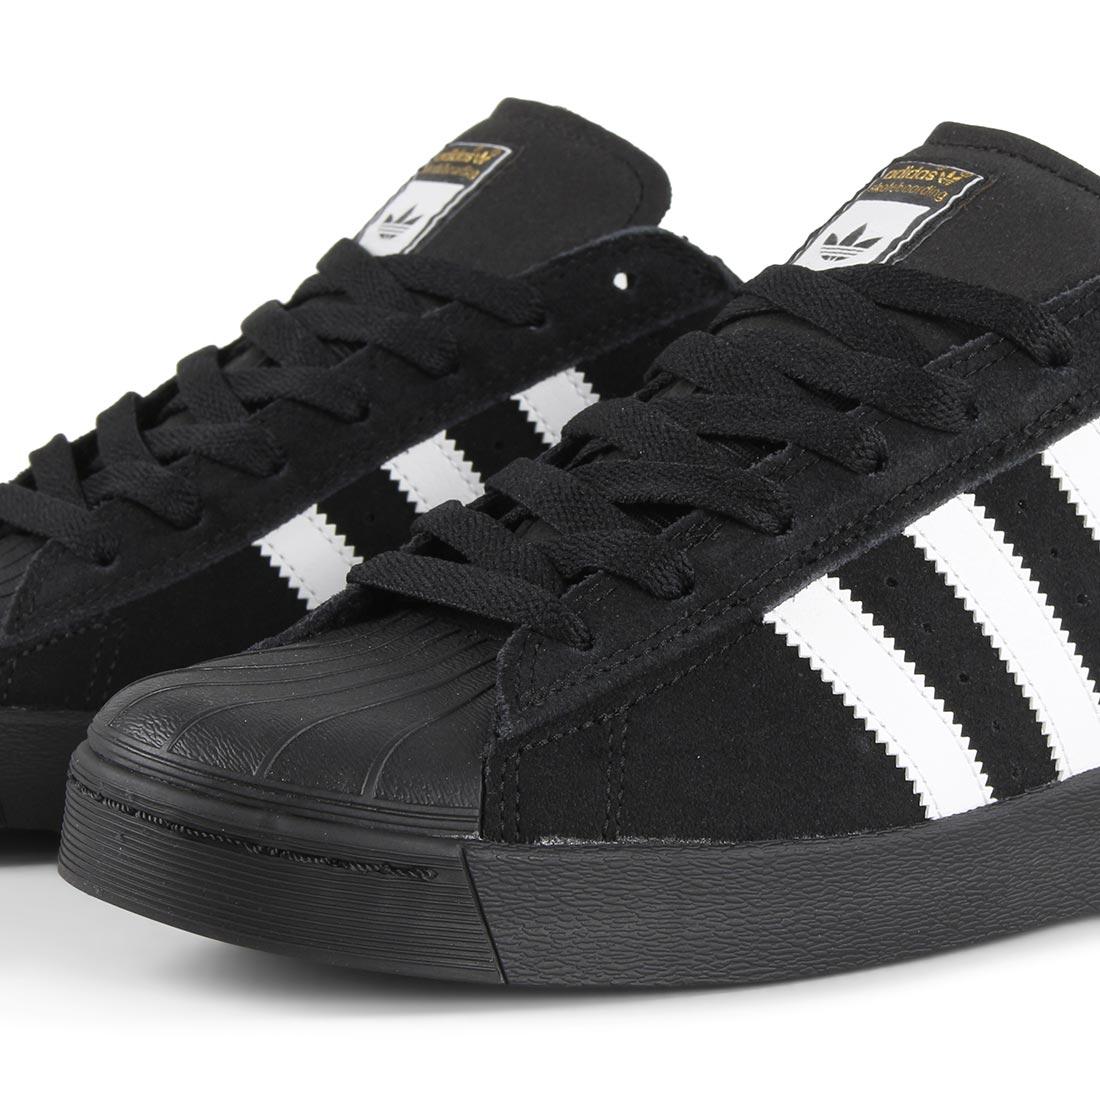 separation shoes ab198 925e9 Adidas Superstar Vulc ADV Shoes - Core Black / White / Core Black